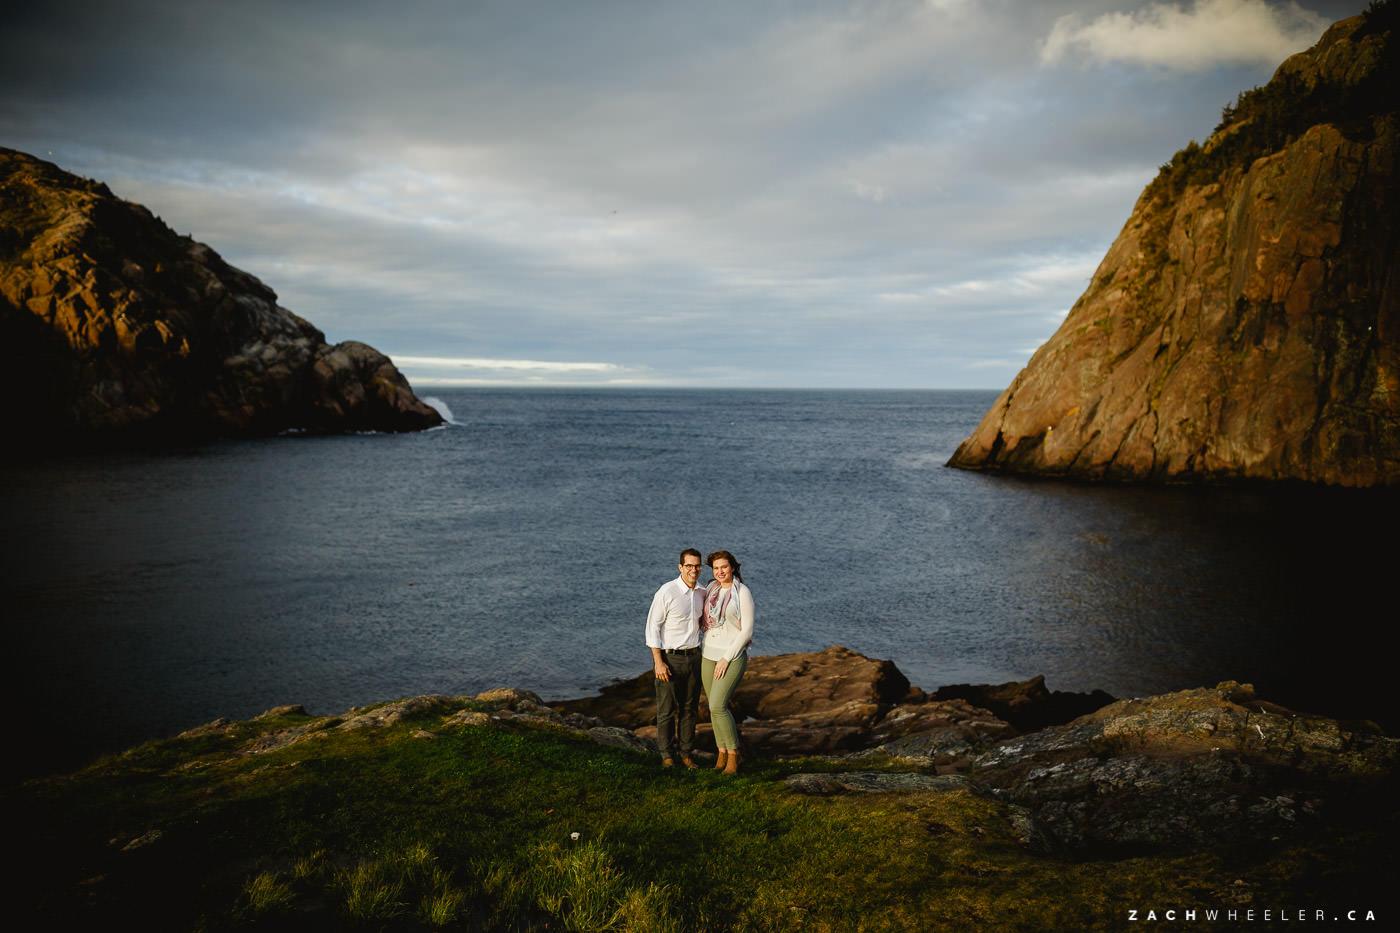 Kim-Dan-Engagement-Photography-StJohns-Newfoundland-3